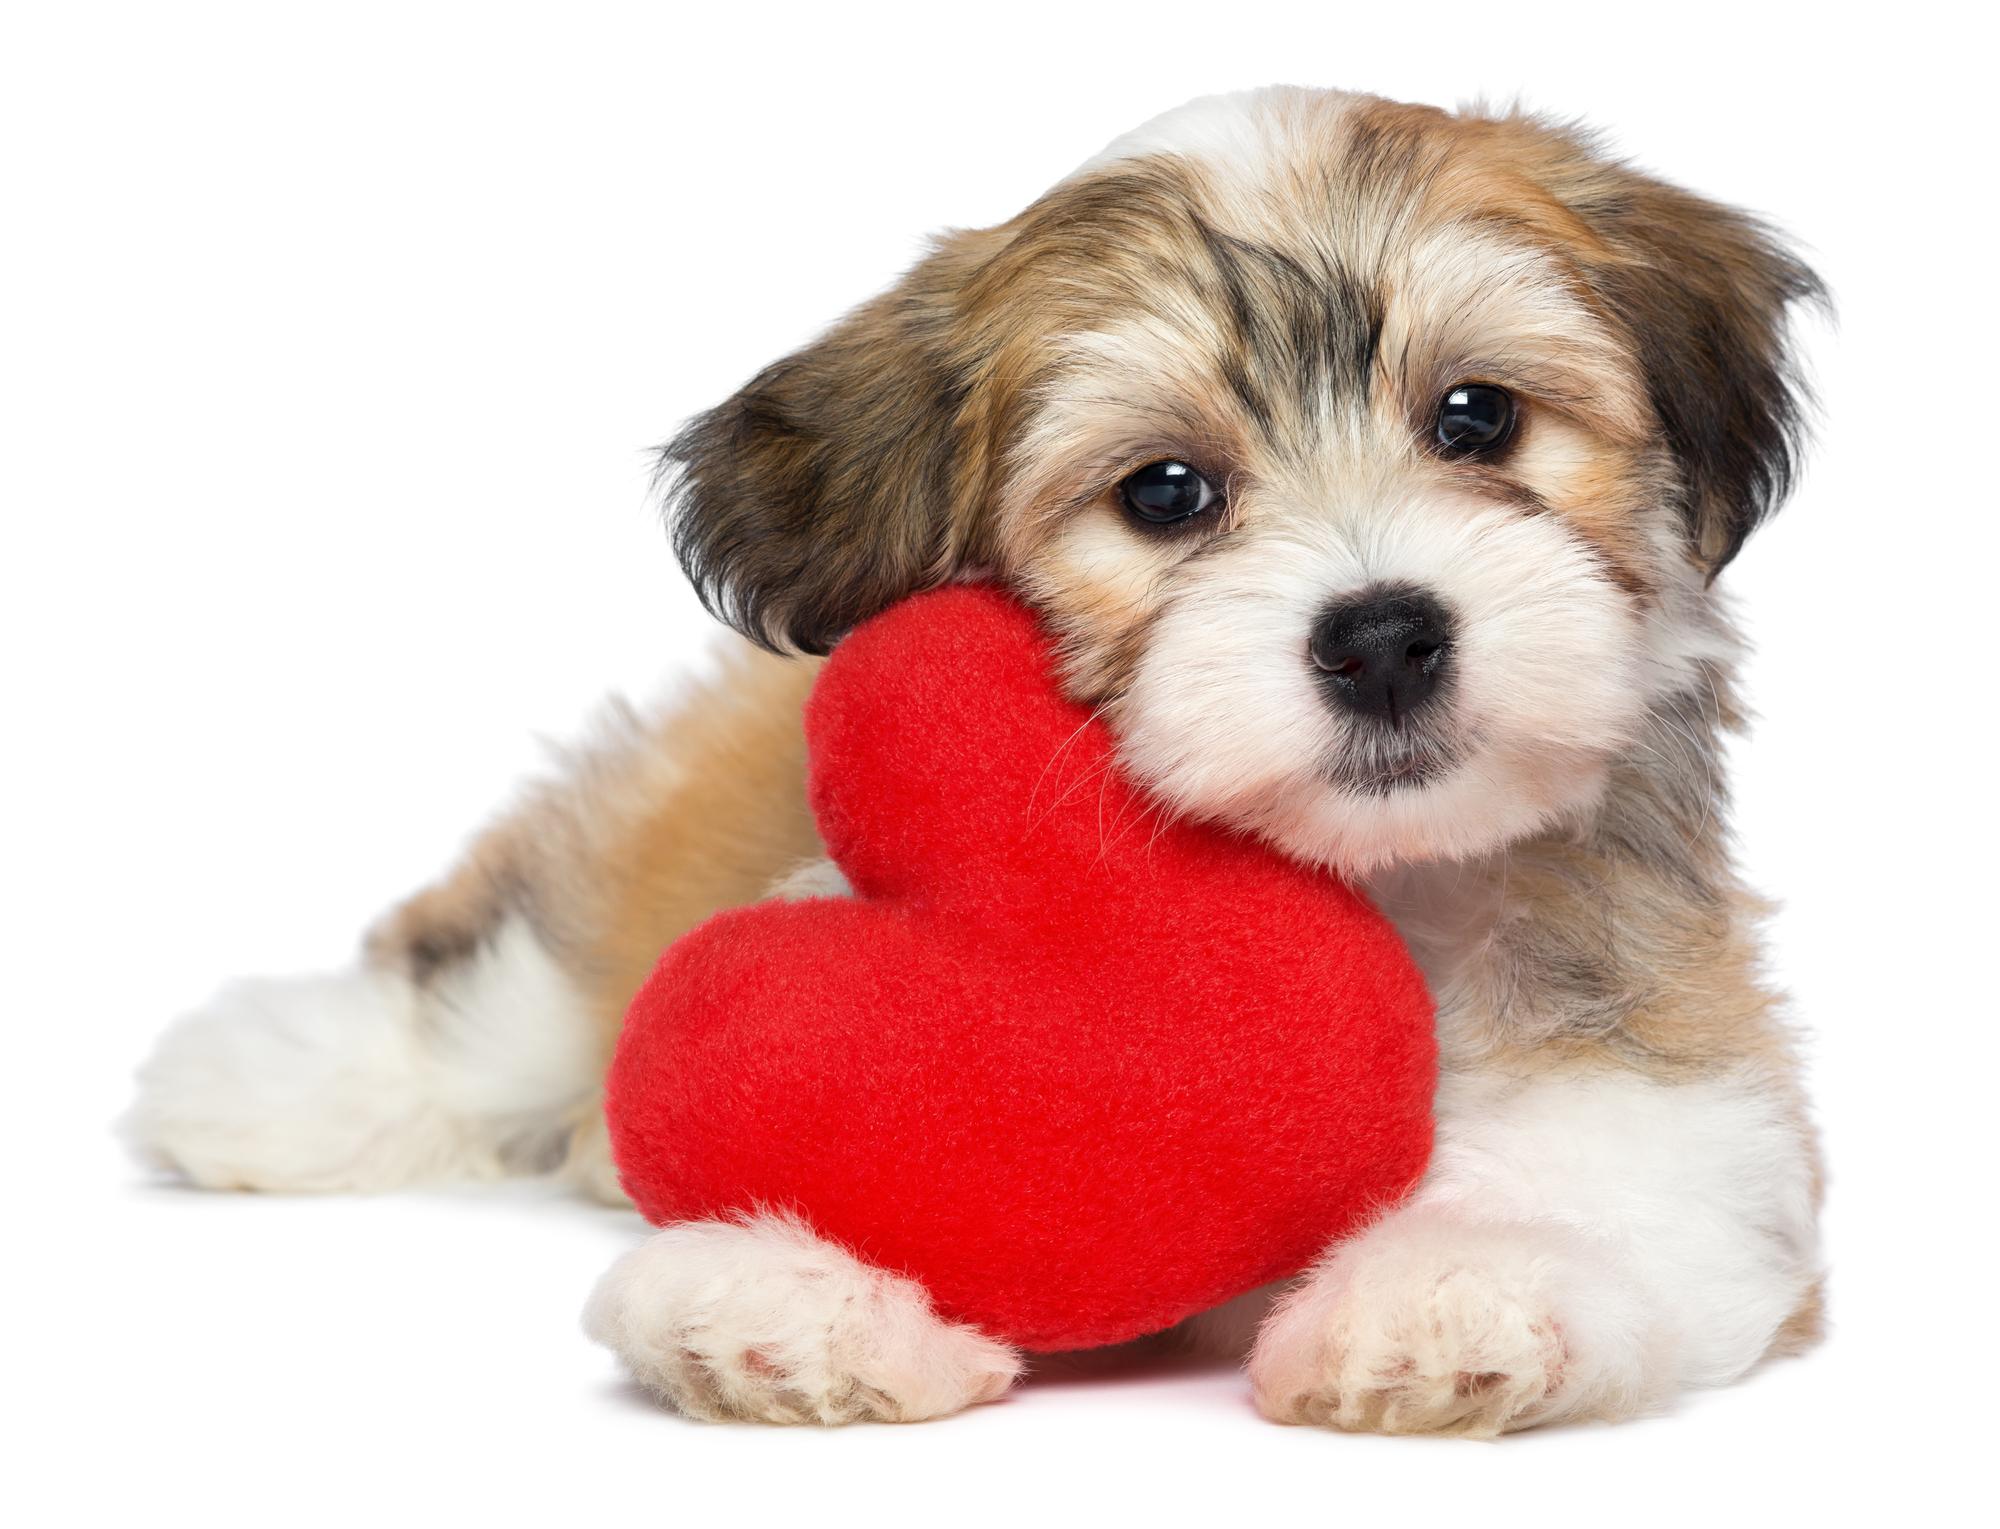 https://www.centroveterinariosanmartino.it/wp-content/uploads/2019/03/cardiologia-veterinaria.jpg